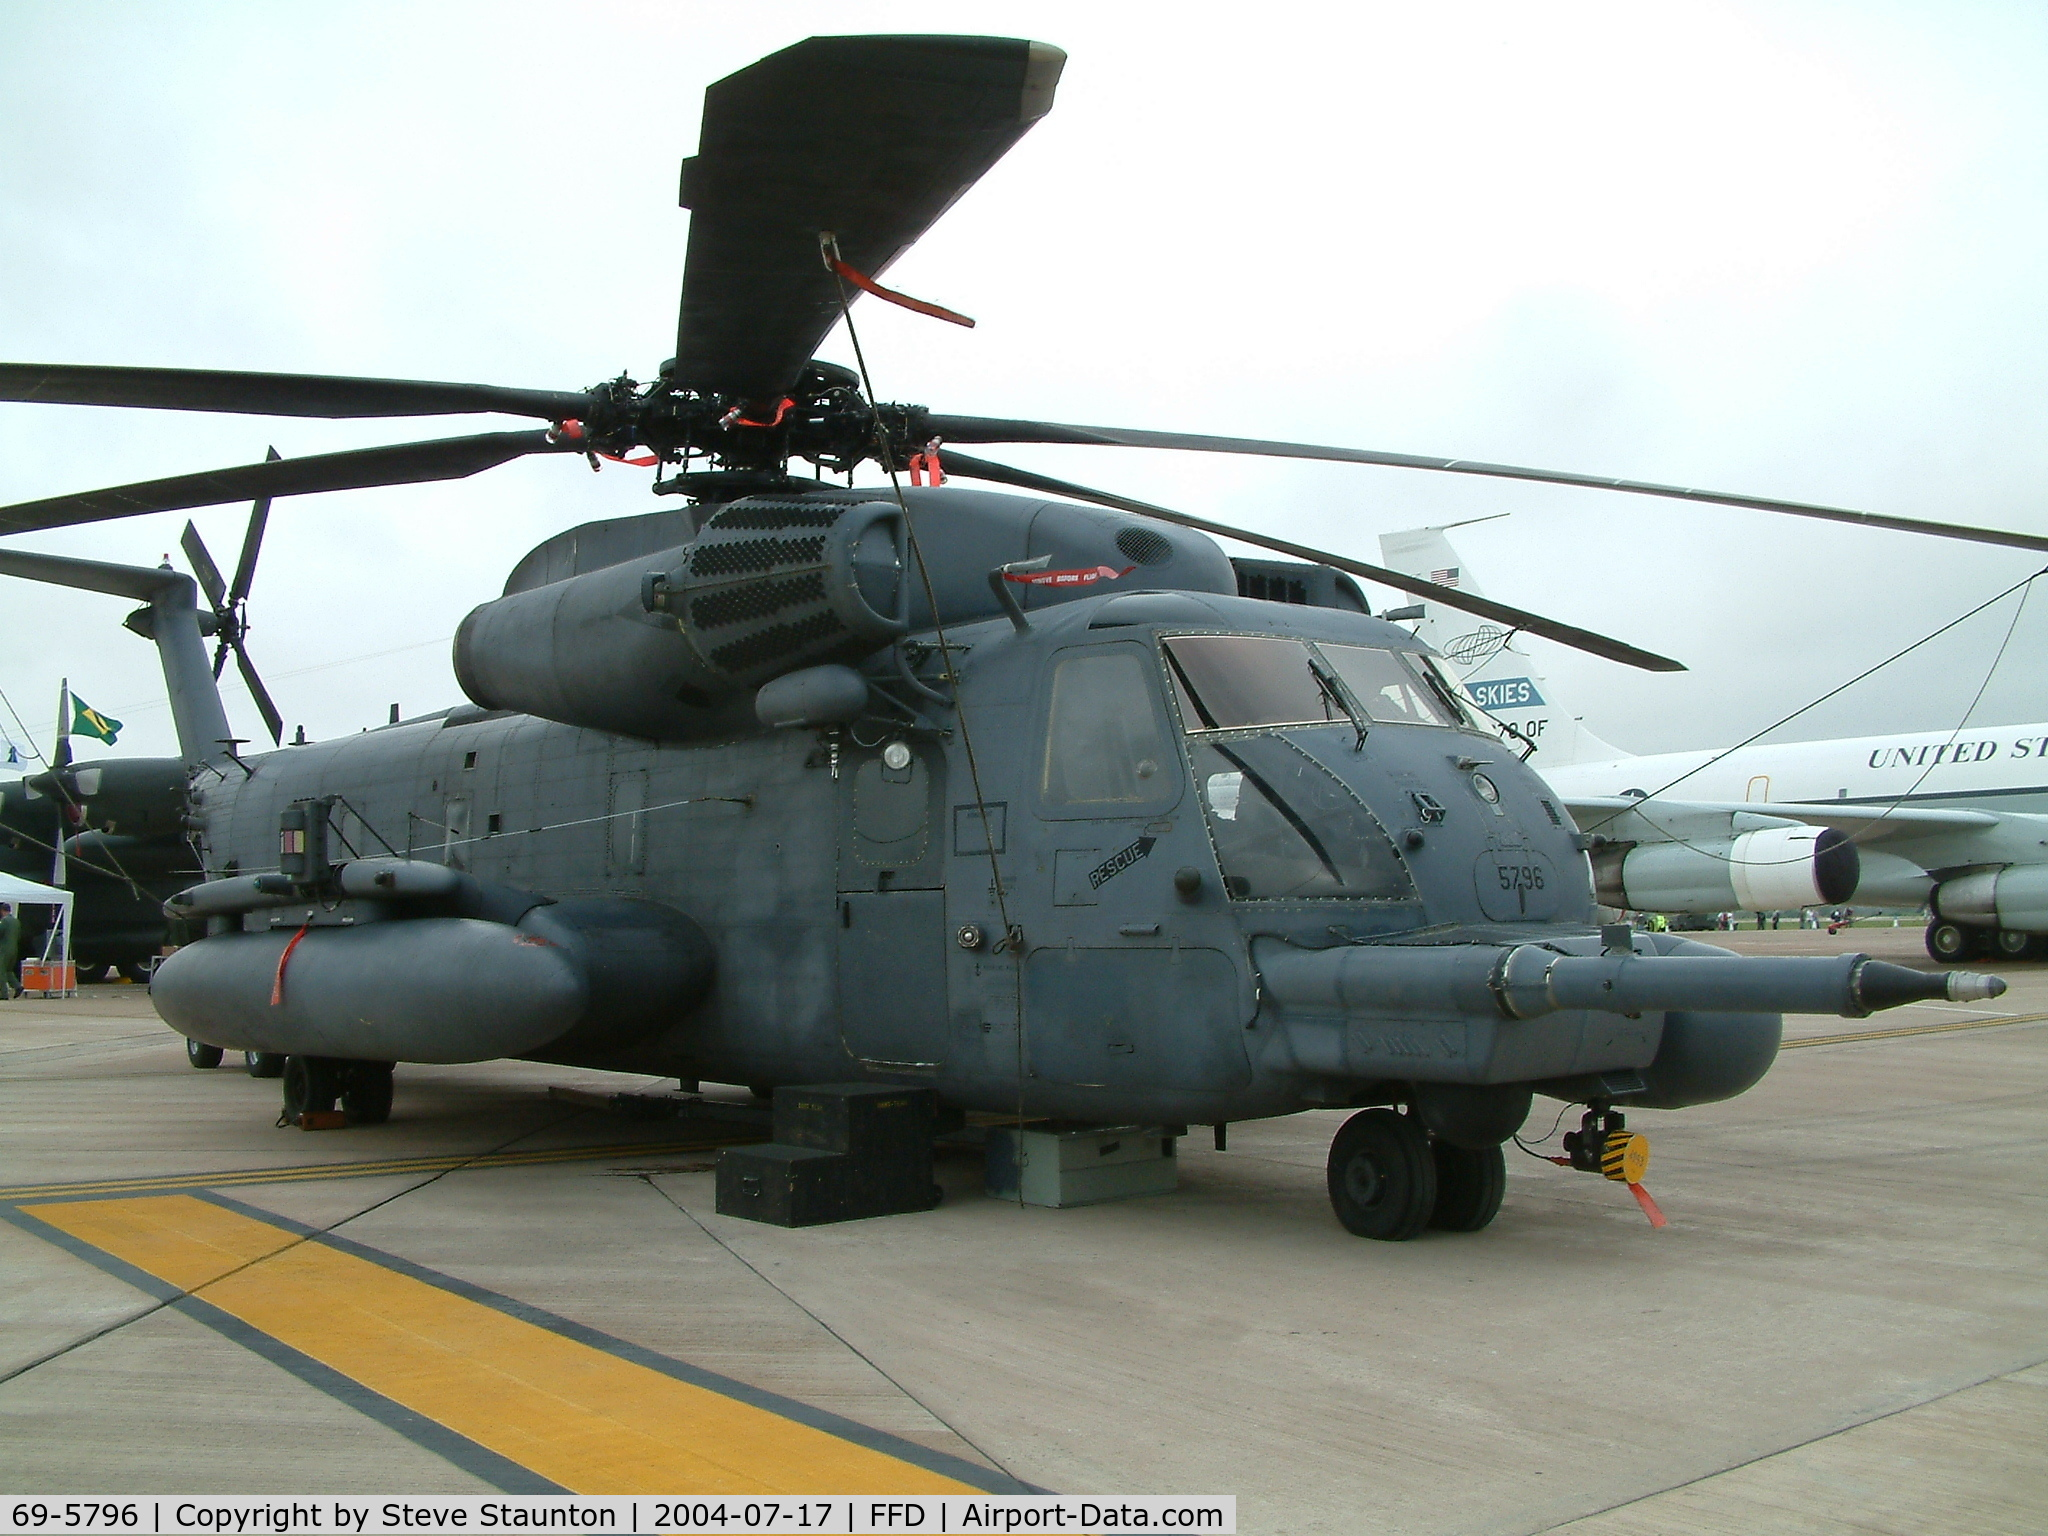 69-5796, 1969 Sikorsky MH-53M Pave Low IV C/N 65-251, Royal International Air Tattoo 2004